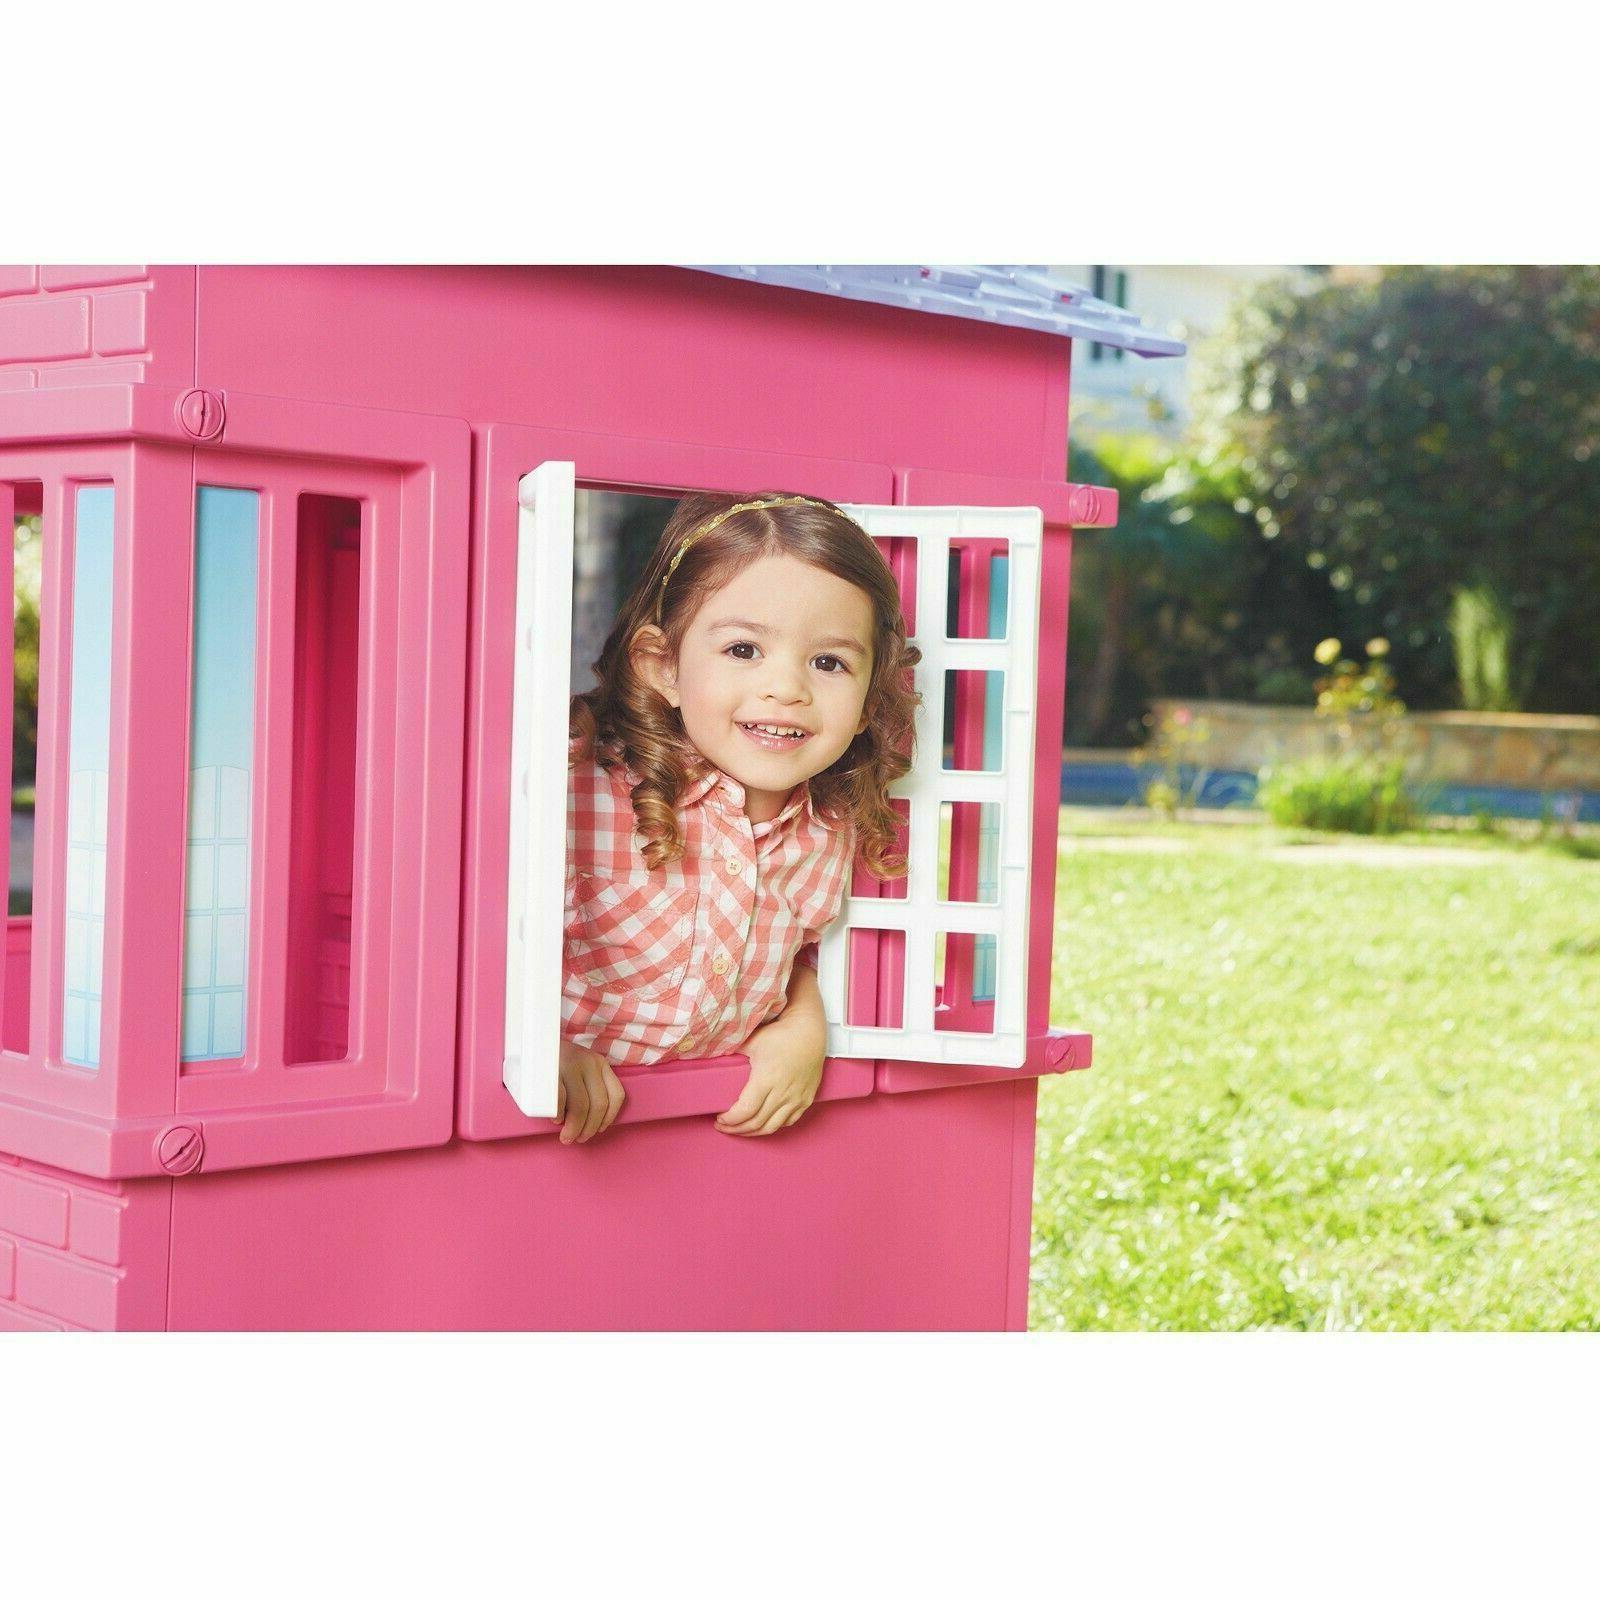 Plastic Toddler Fun Playhouse